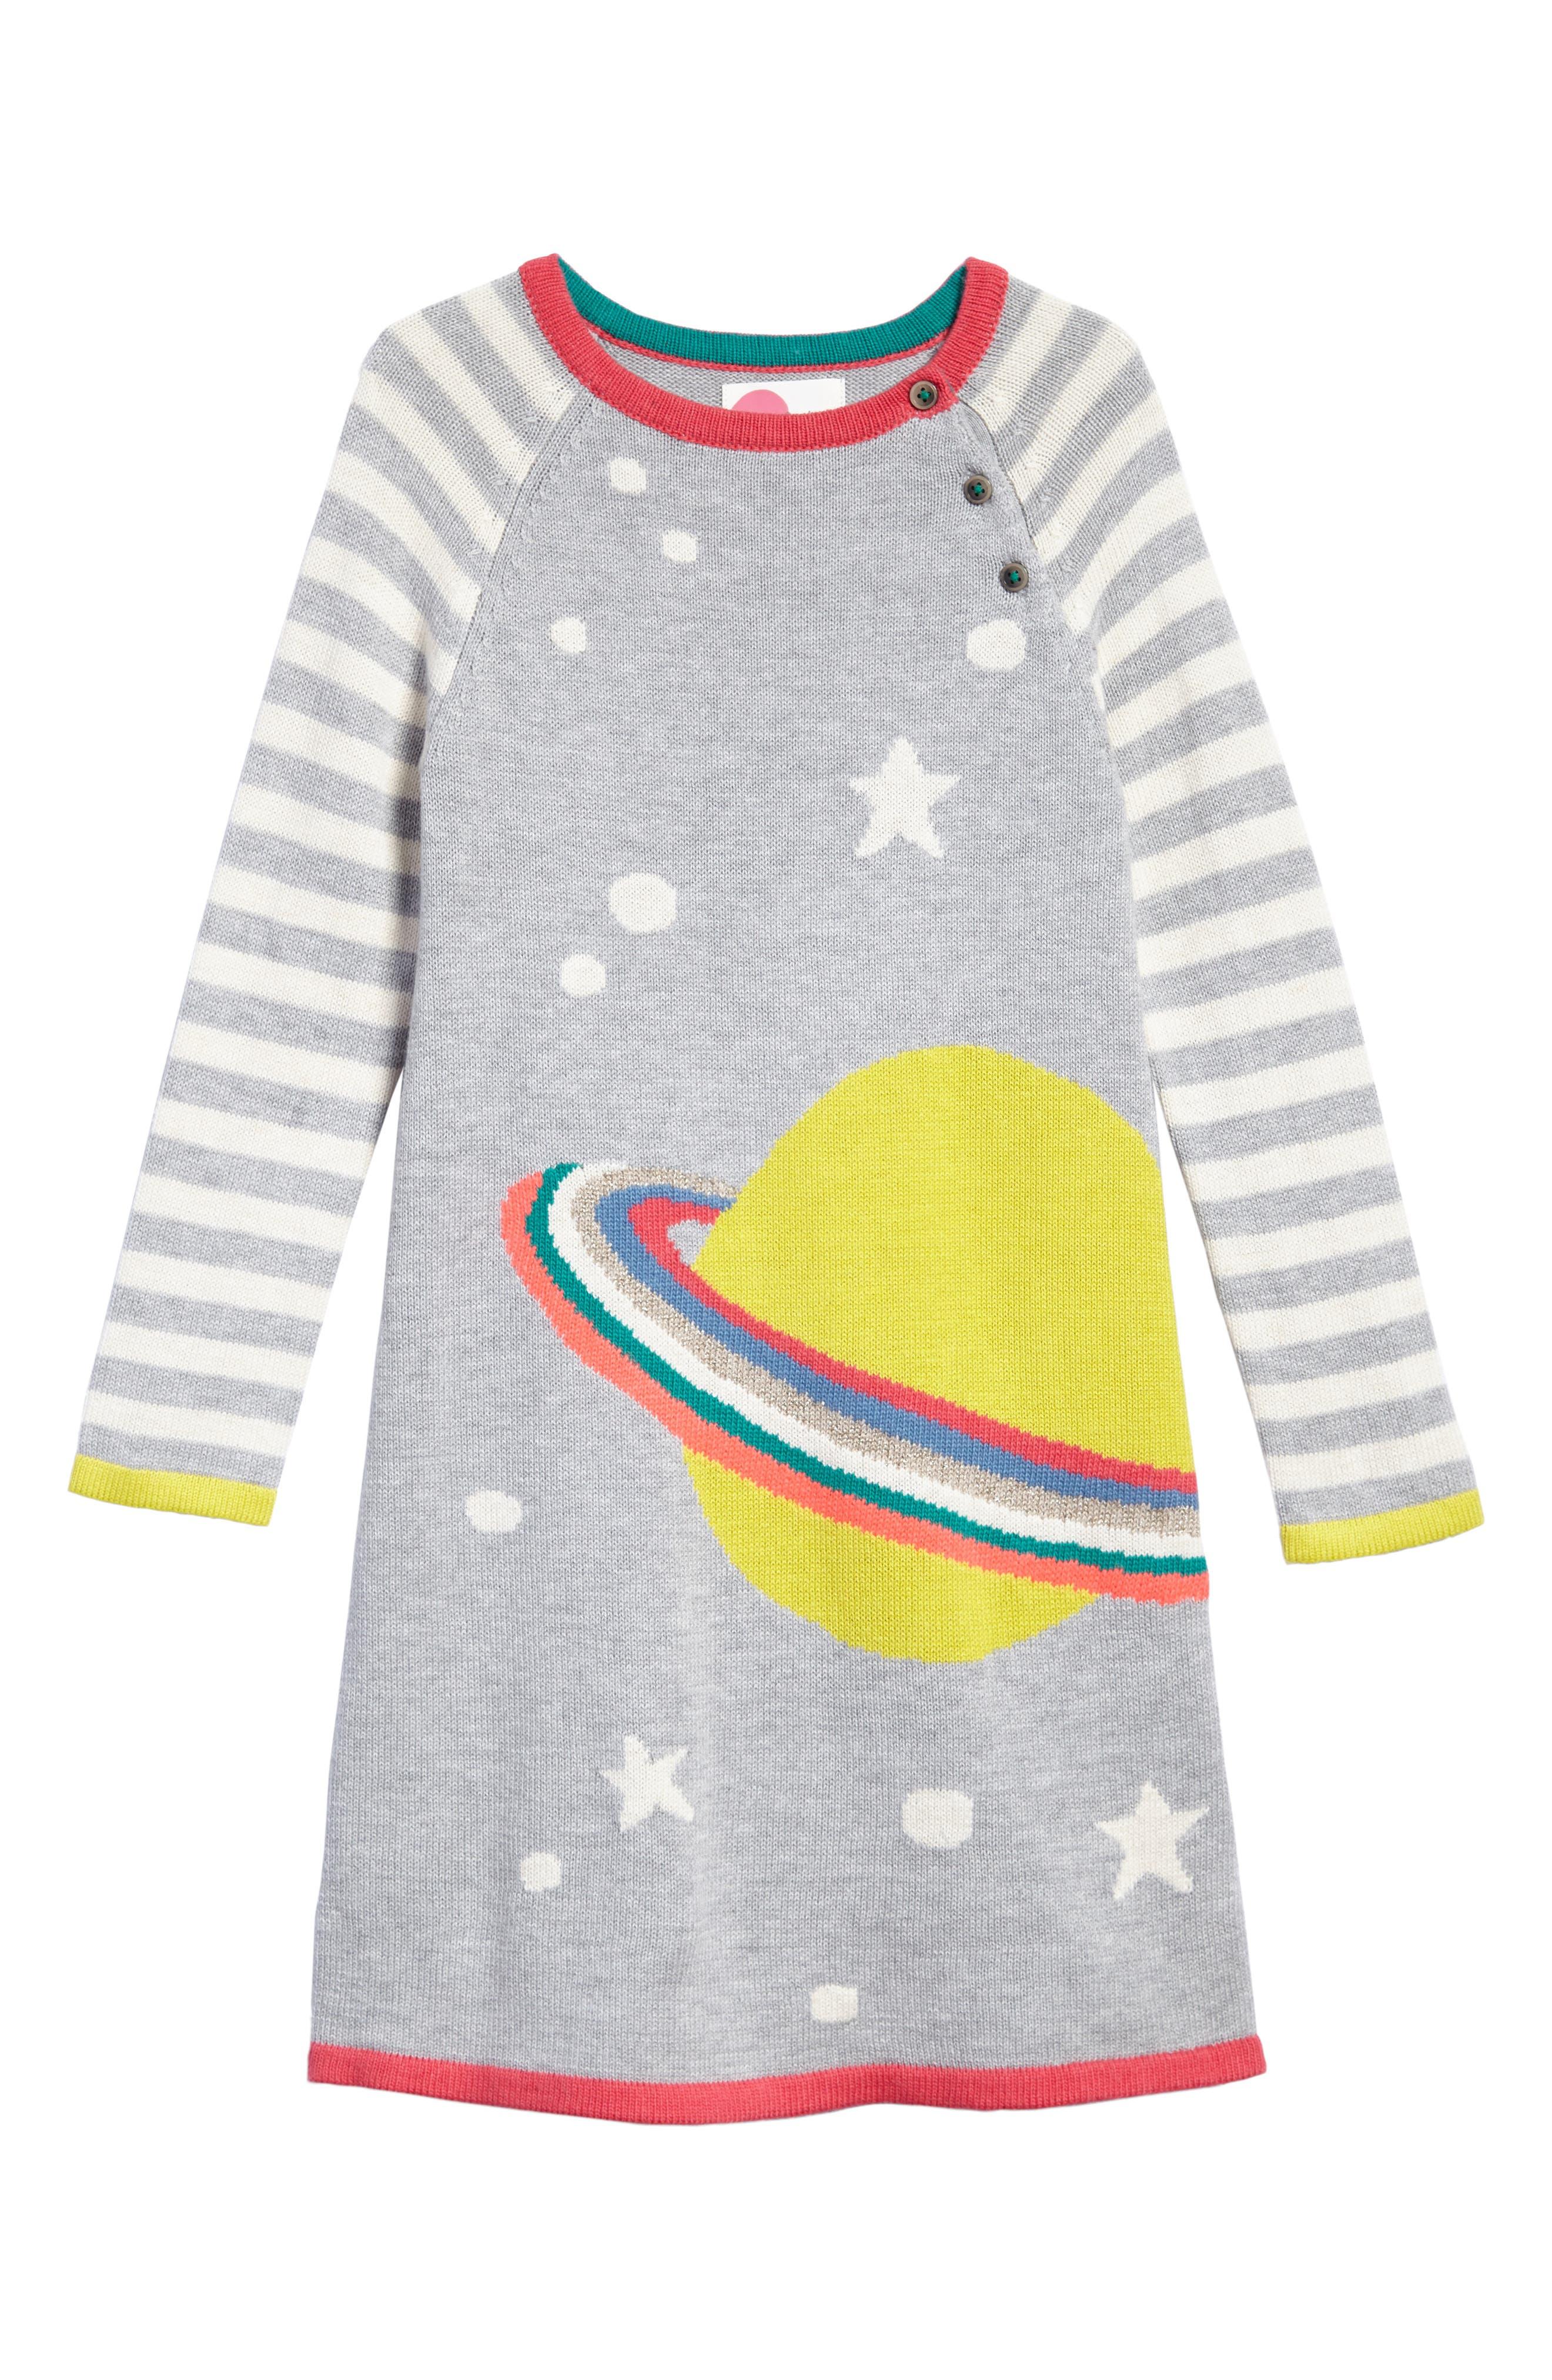 Alternate Image 1 Selected - Mini Boden Fun Knit Dress (Toddler Girls, Little Girls & Big Girls)